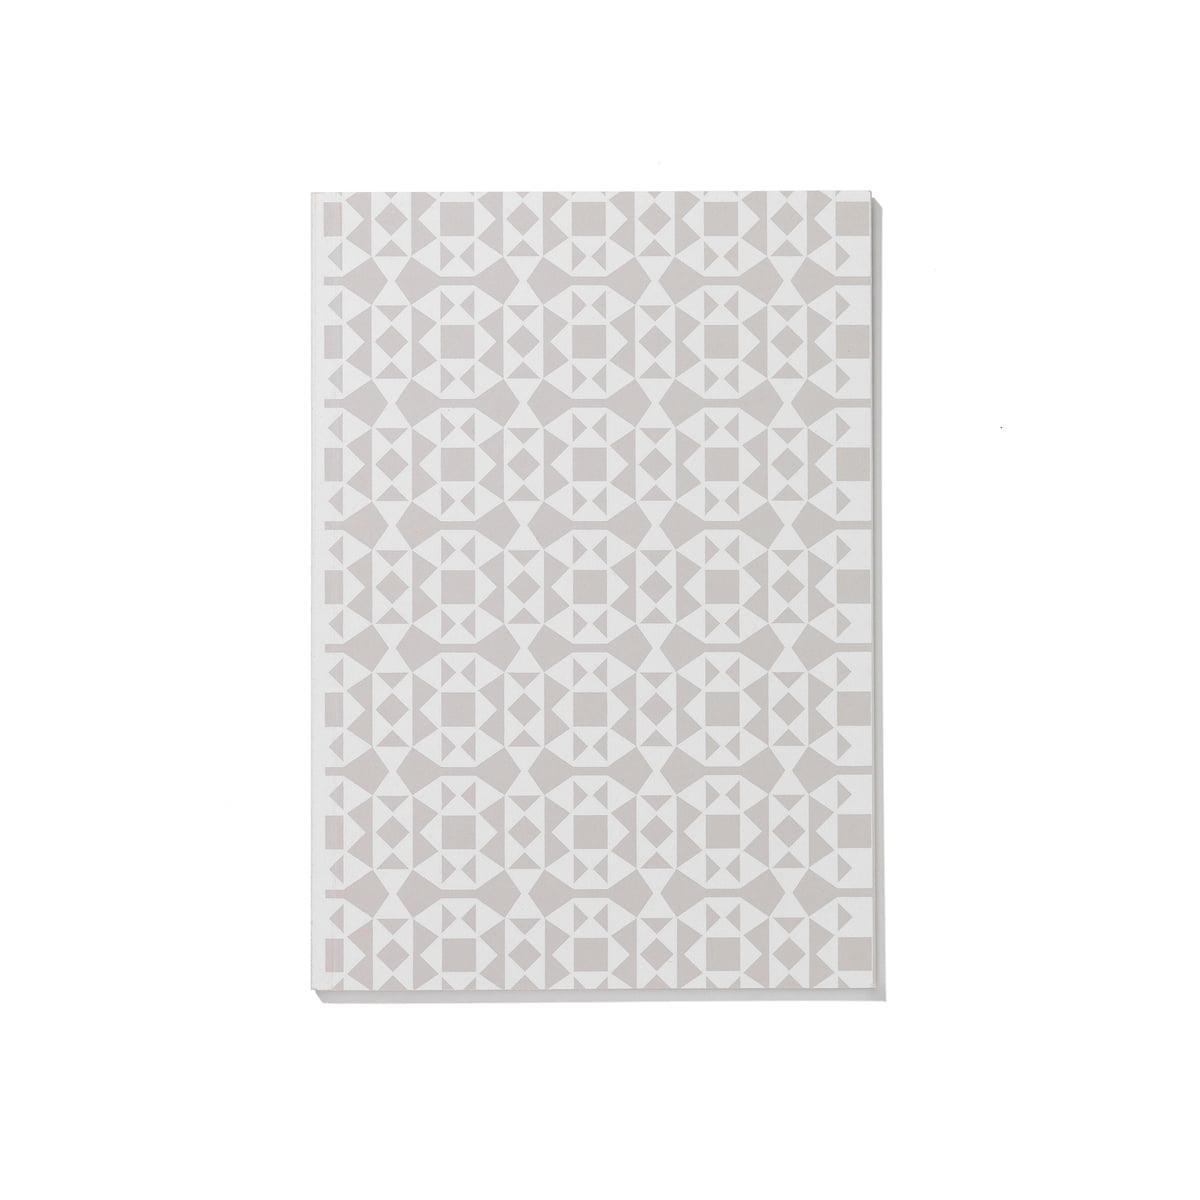 Vitra - Notizbuch Softcover A5, Facets weiß | Dekoration > Accessoires | Weiß | Vitra